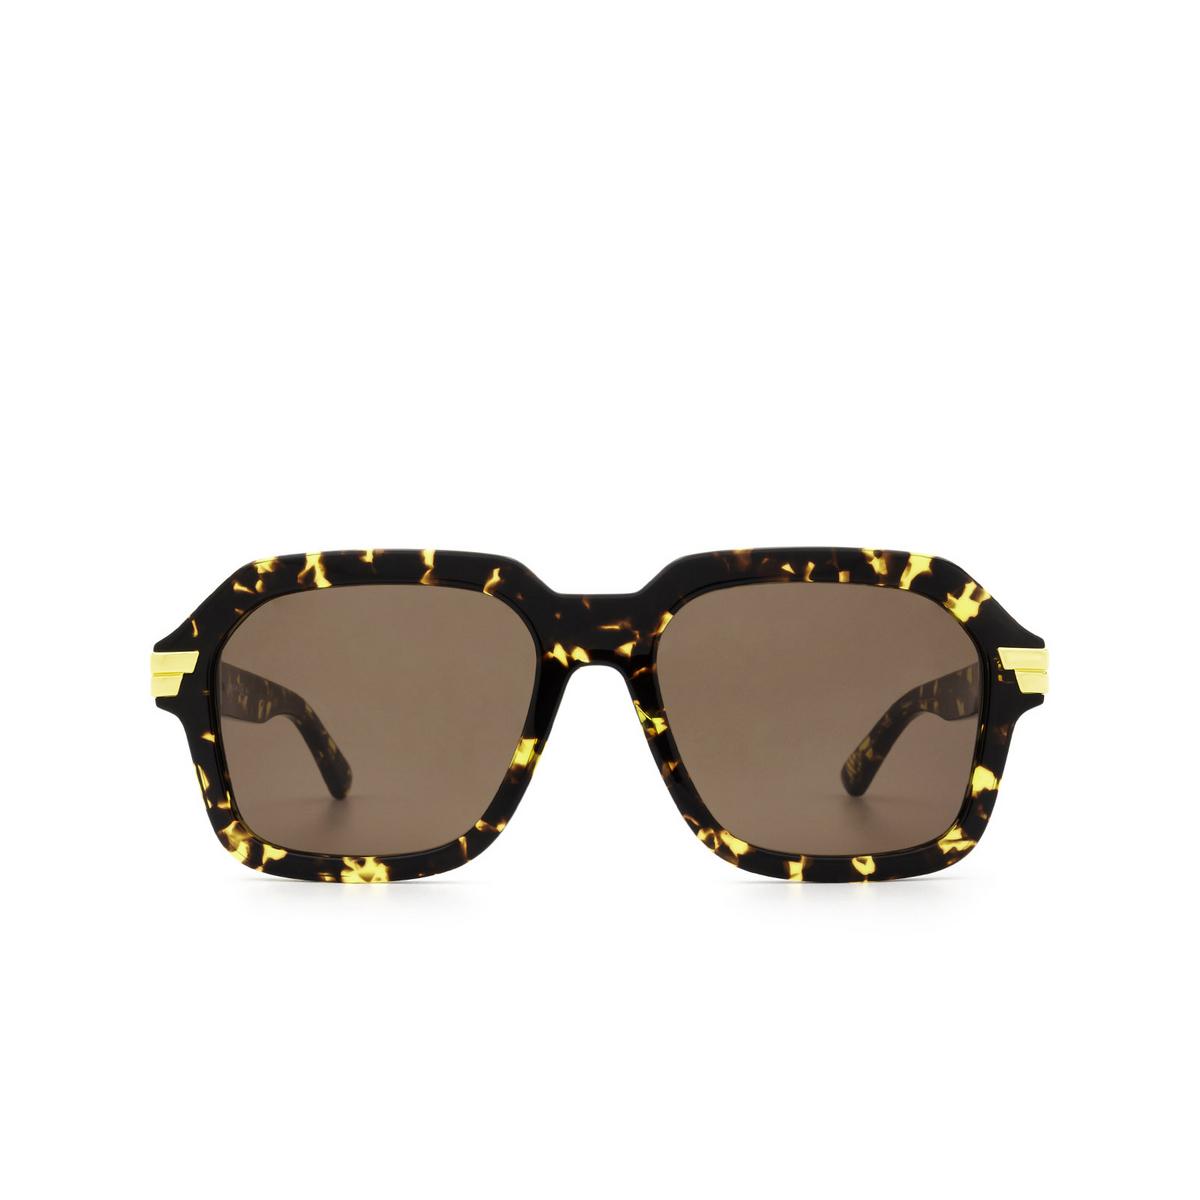 Bottega Veneta® Square Sunglasses: BV1123S color Havana 002 - front view.